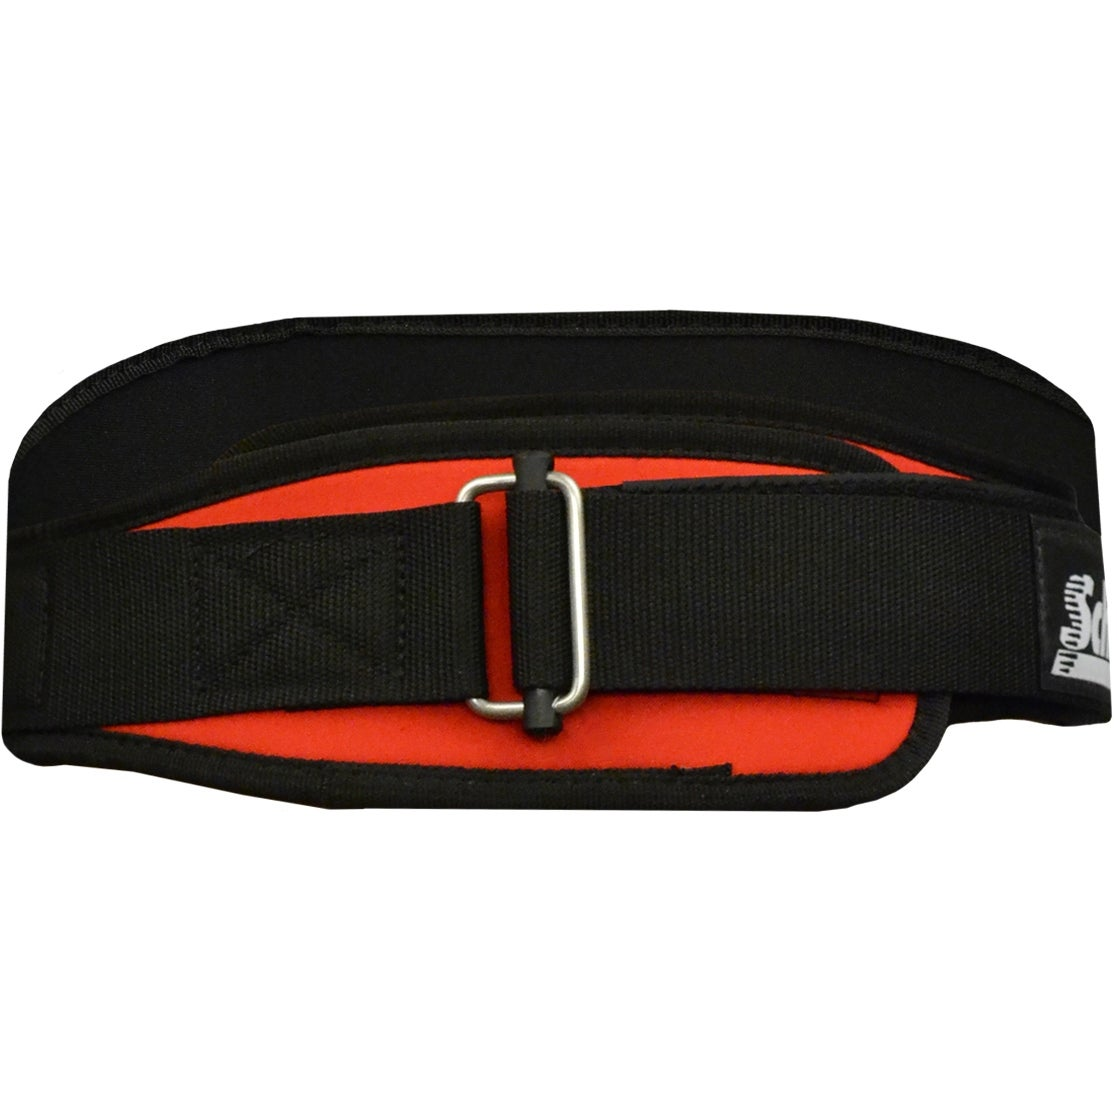 "Red Schiek Sports Model 2004 Nylon 4 3//4/"" Weight Lifting Belt"